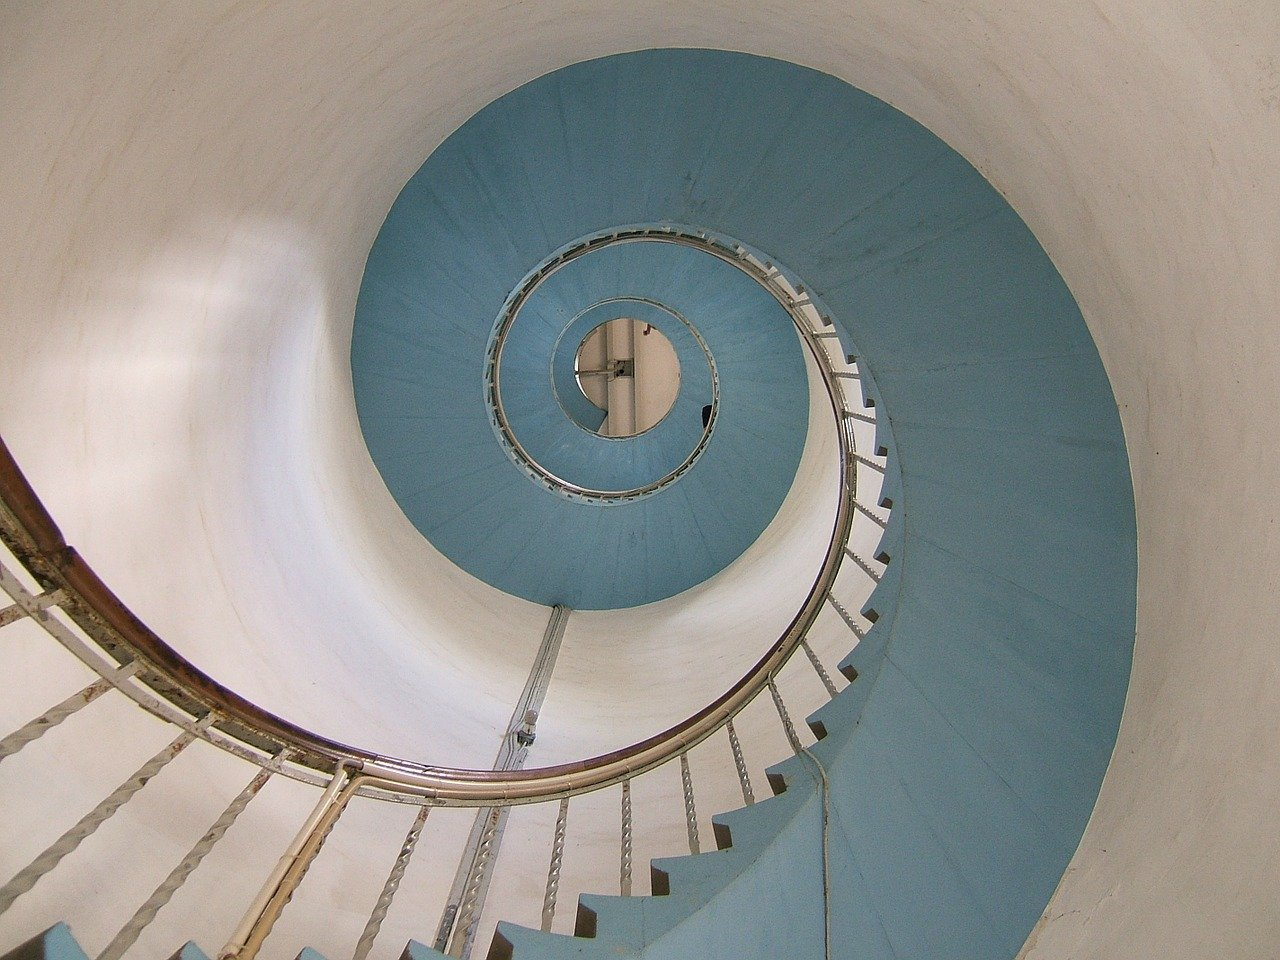 lighthouse, stairs, snail-62761.jpg